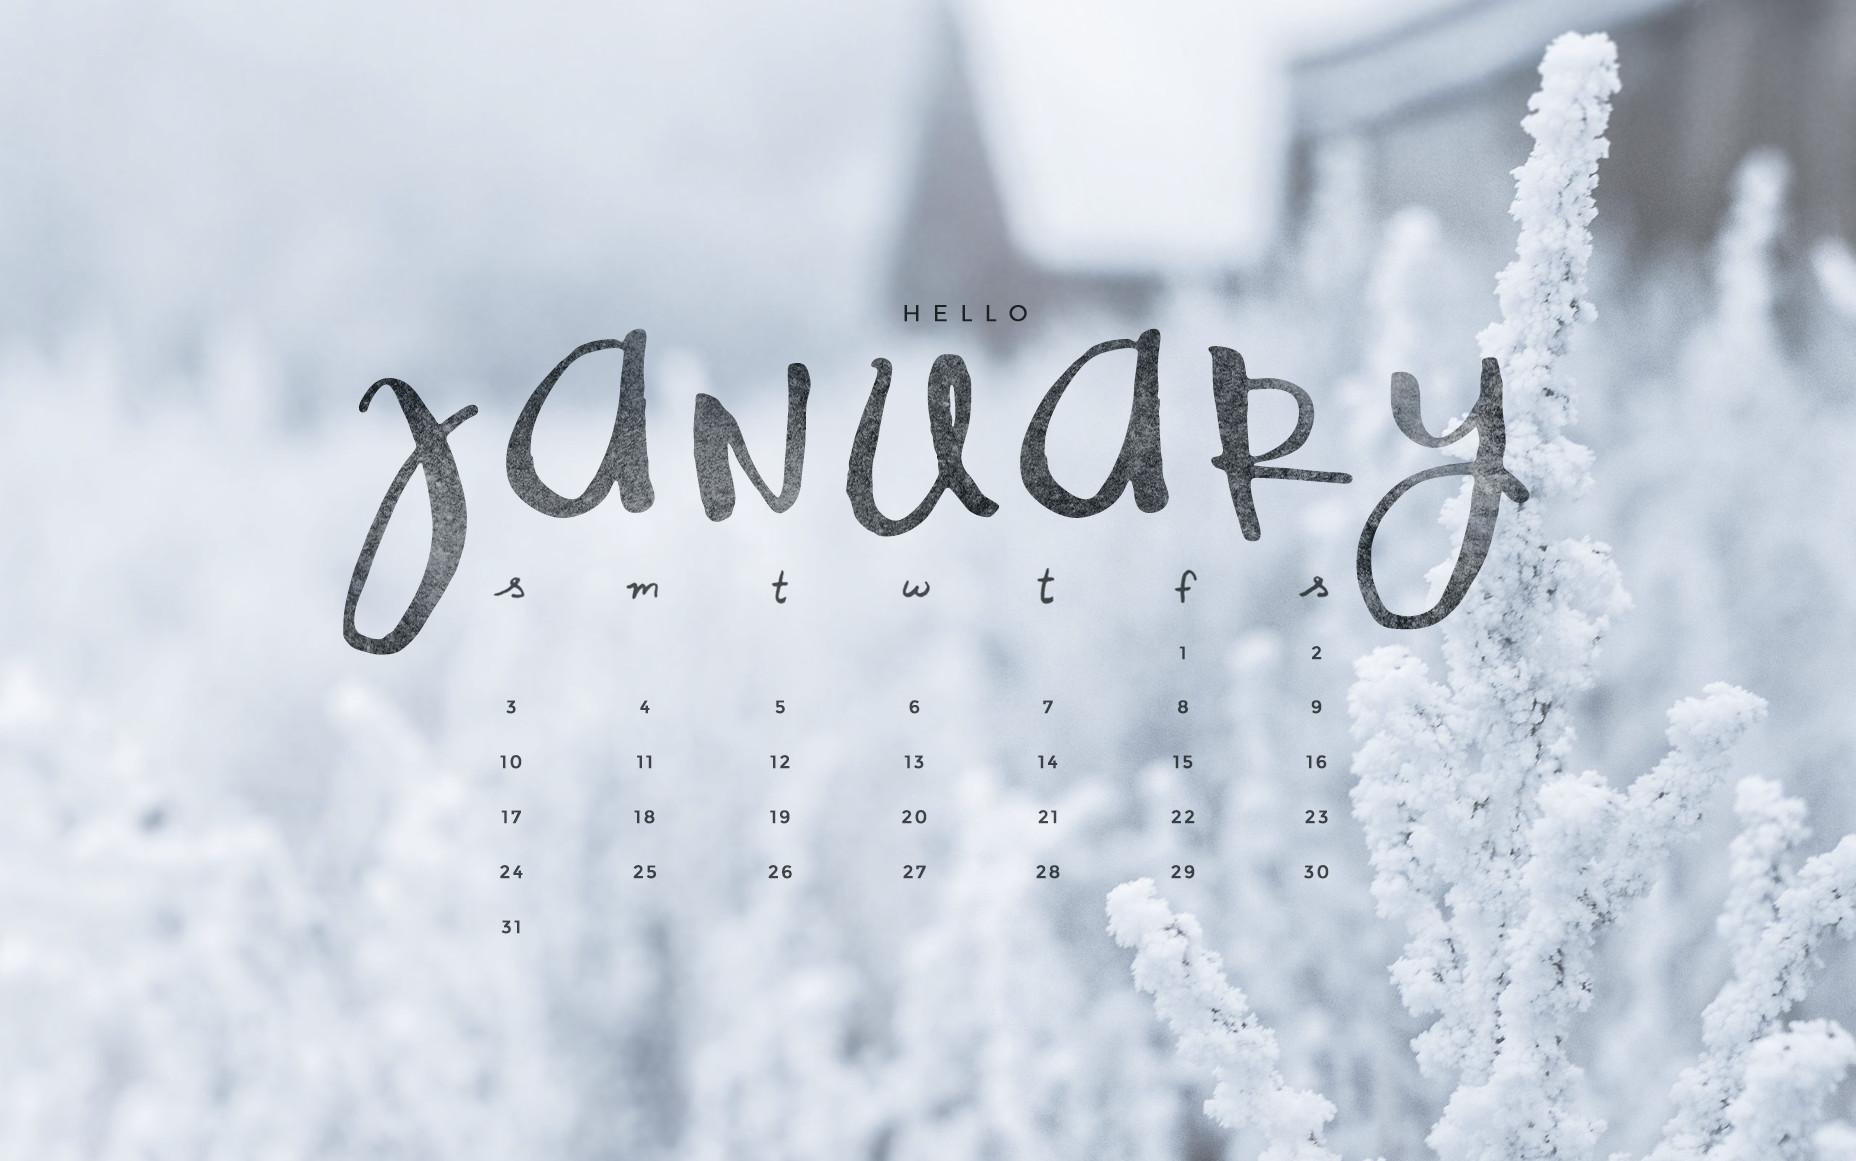 97] January 2018 Calendar Wallpapers on WallpaperSafari 1856x1161